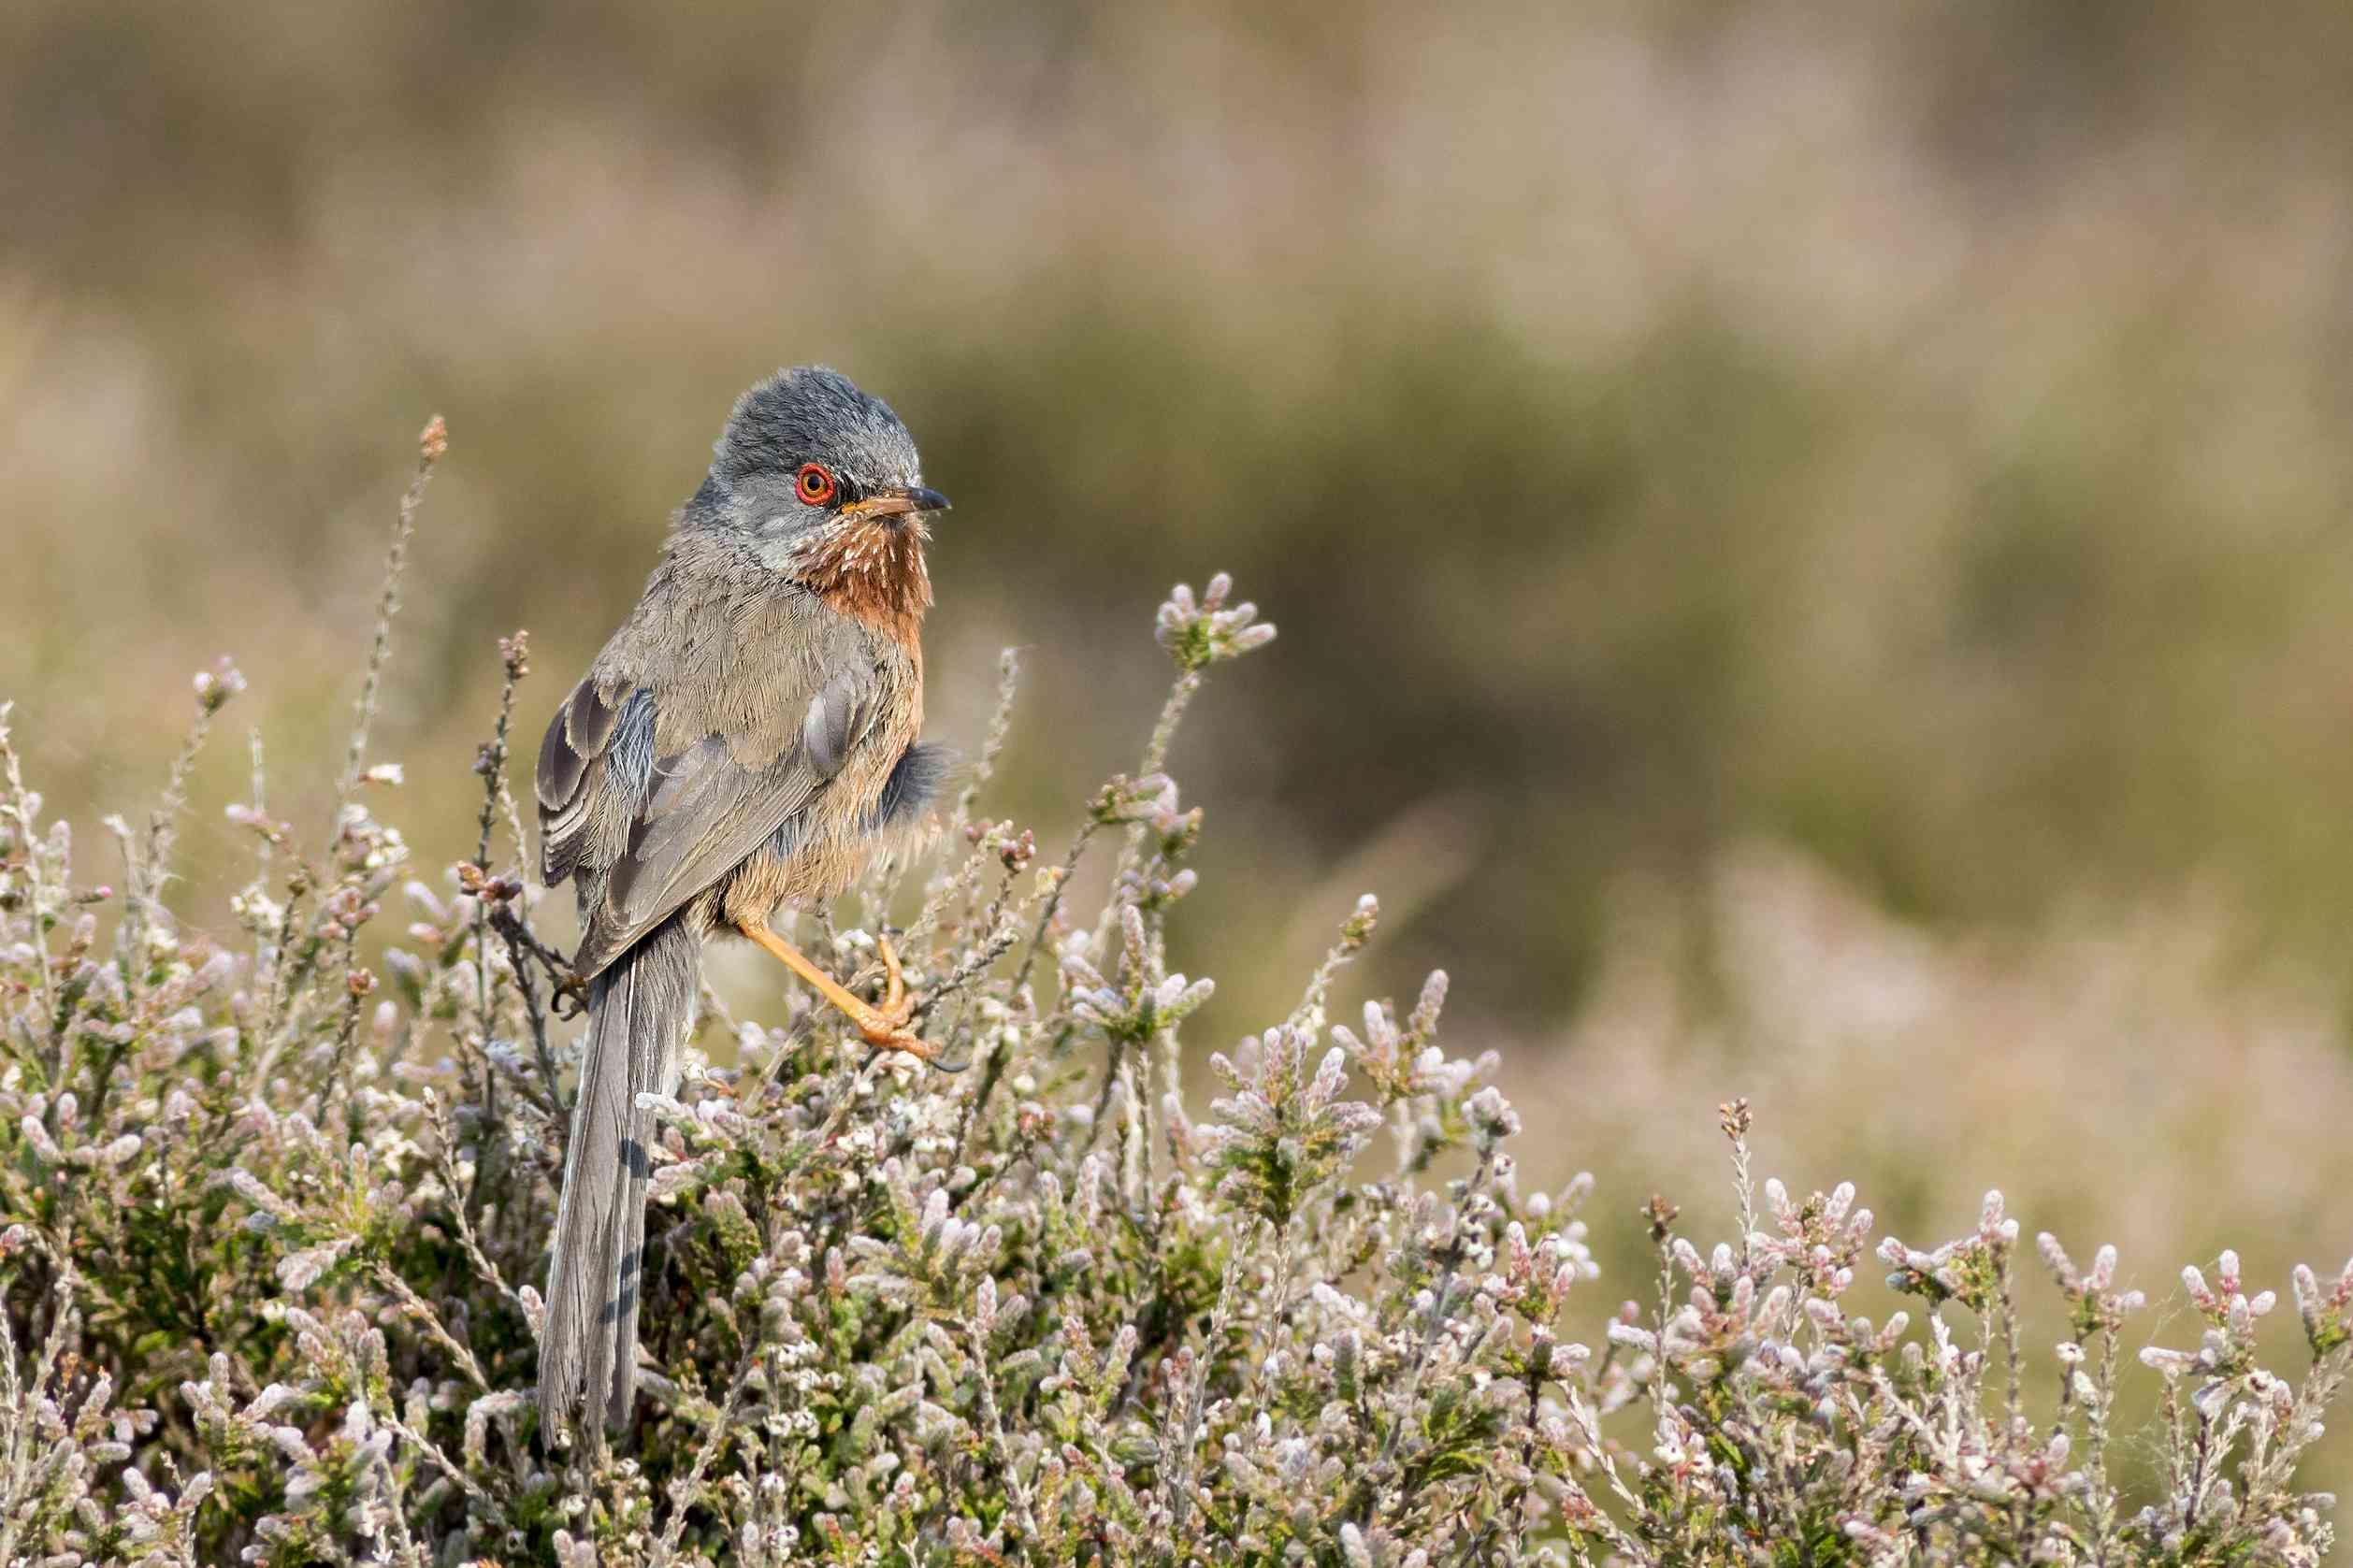 Dartford warbler perching on top of a bush